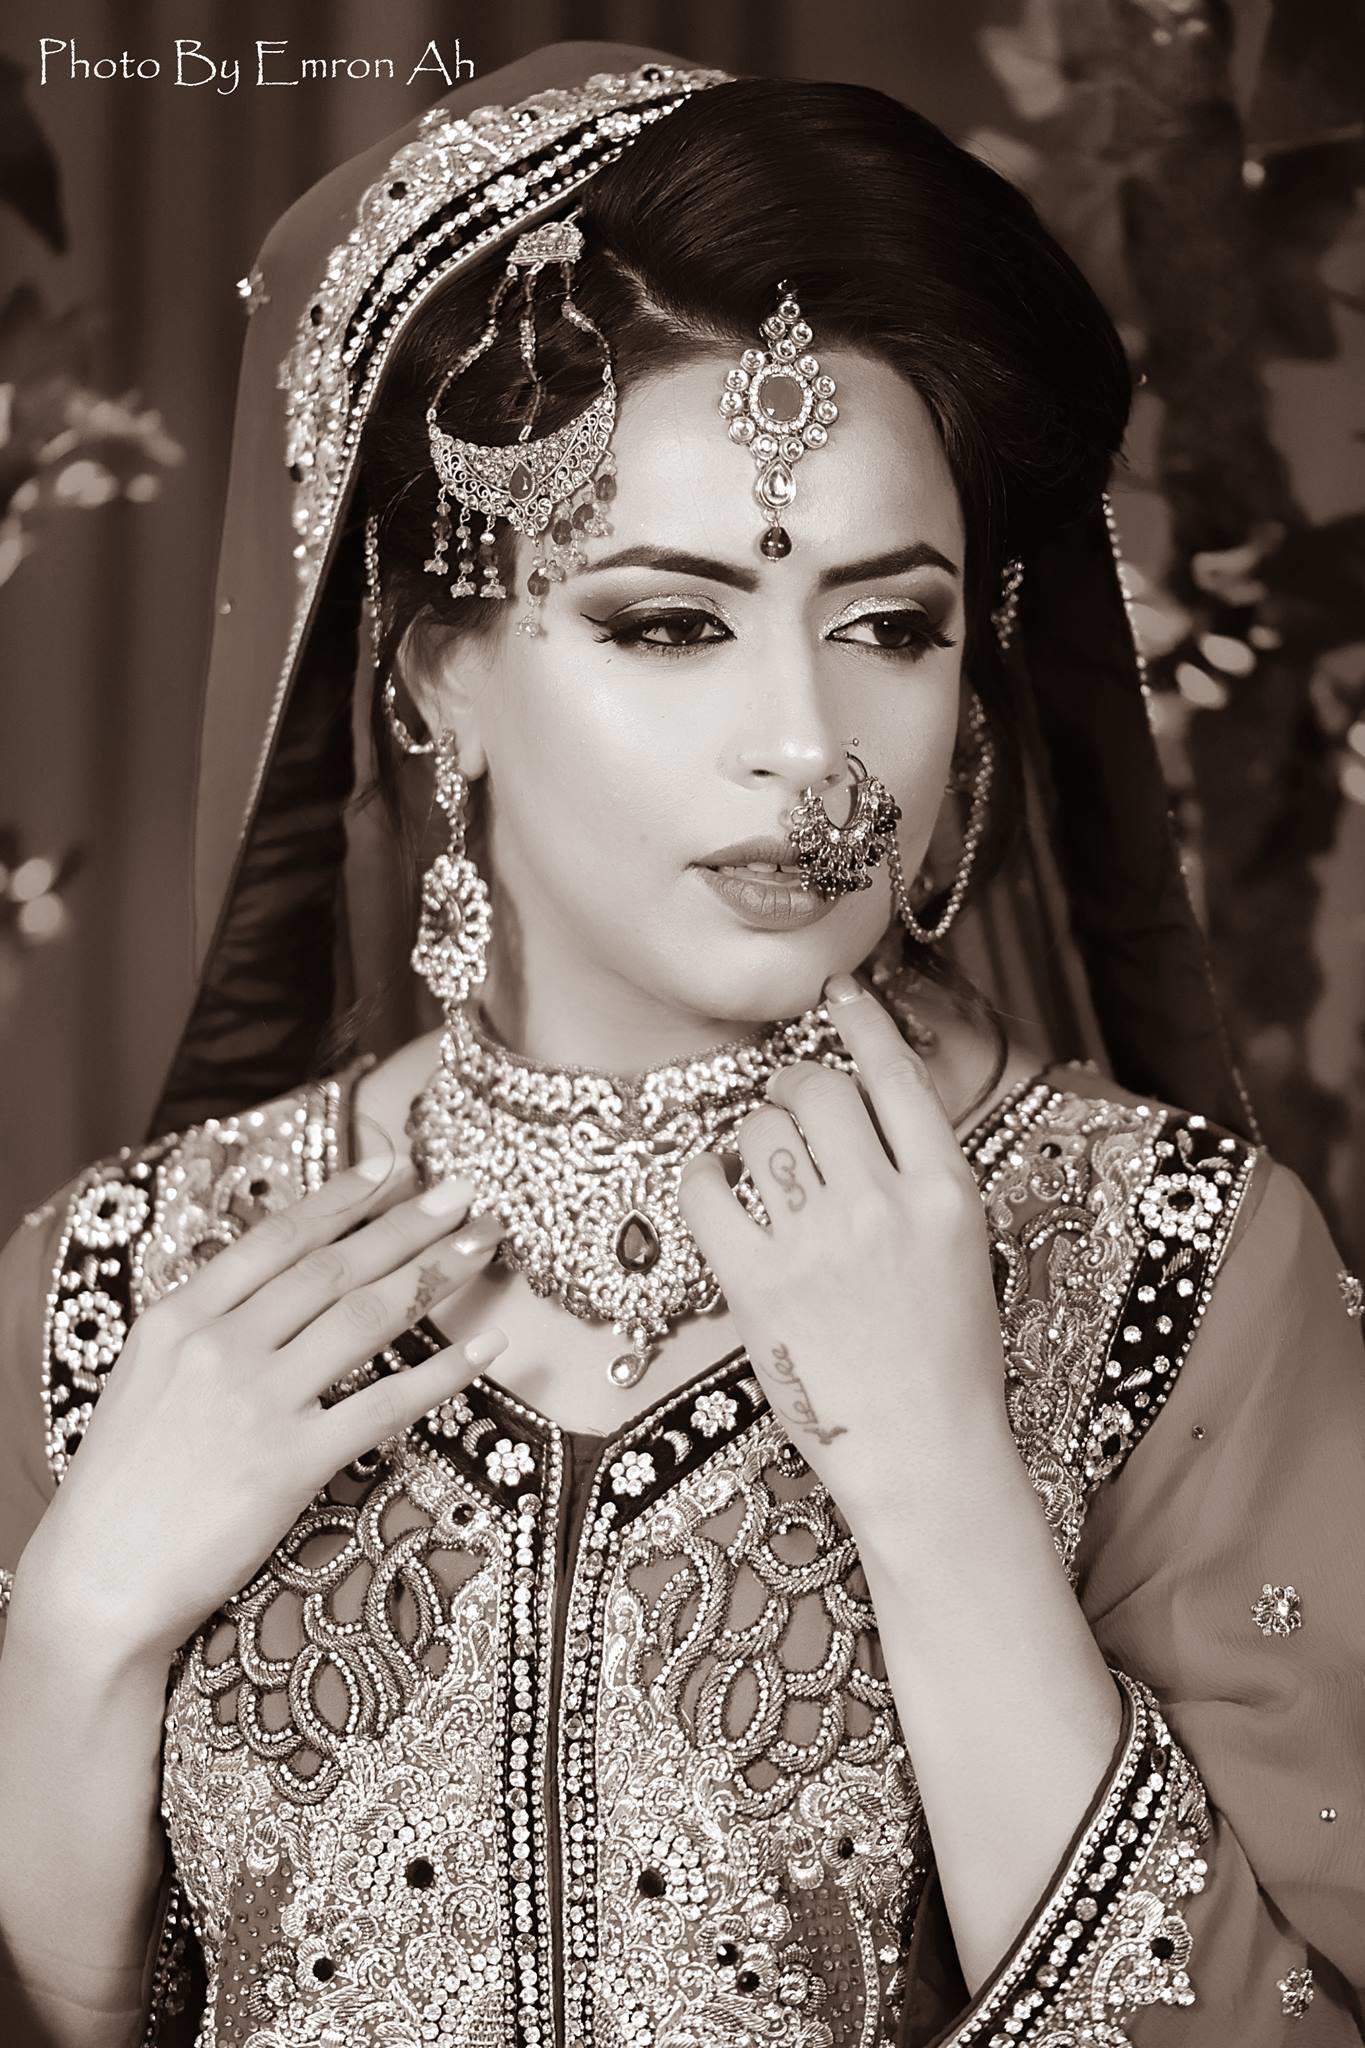 S.Ozair Beauty Salon image 7